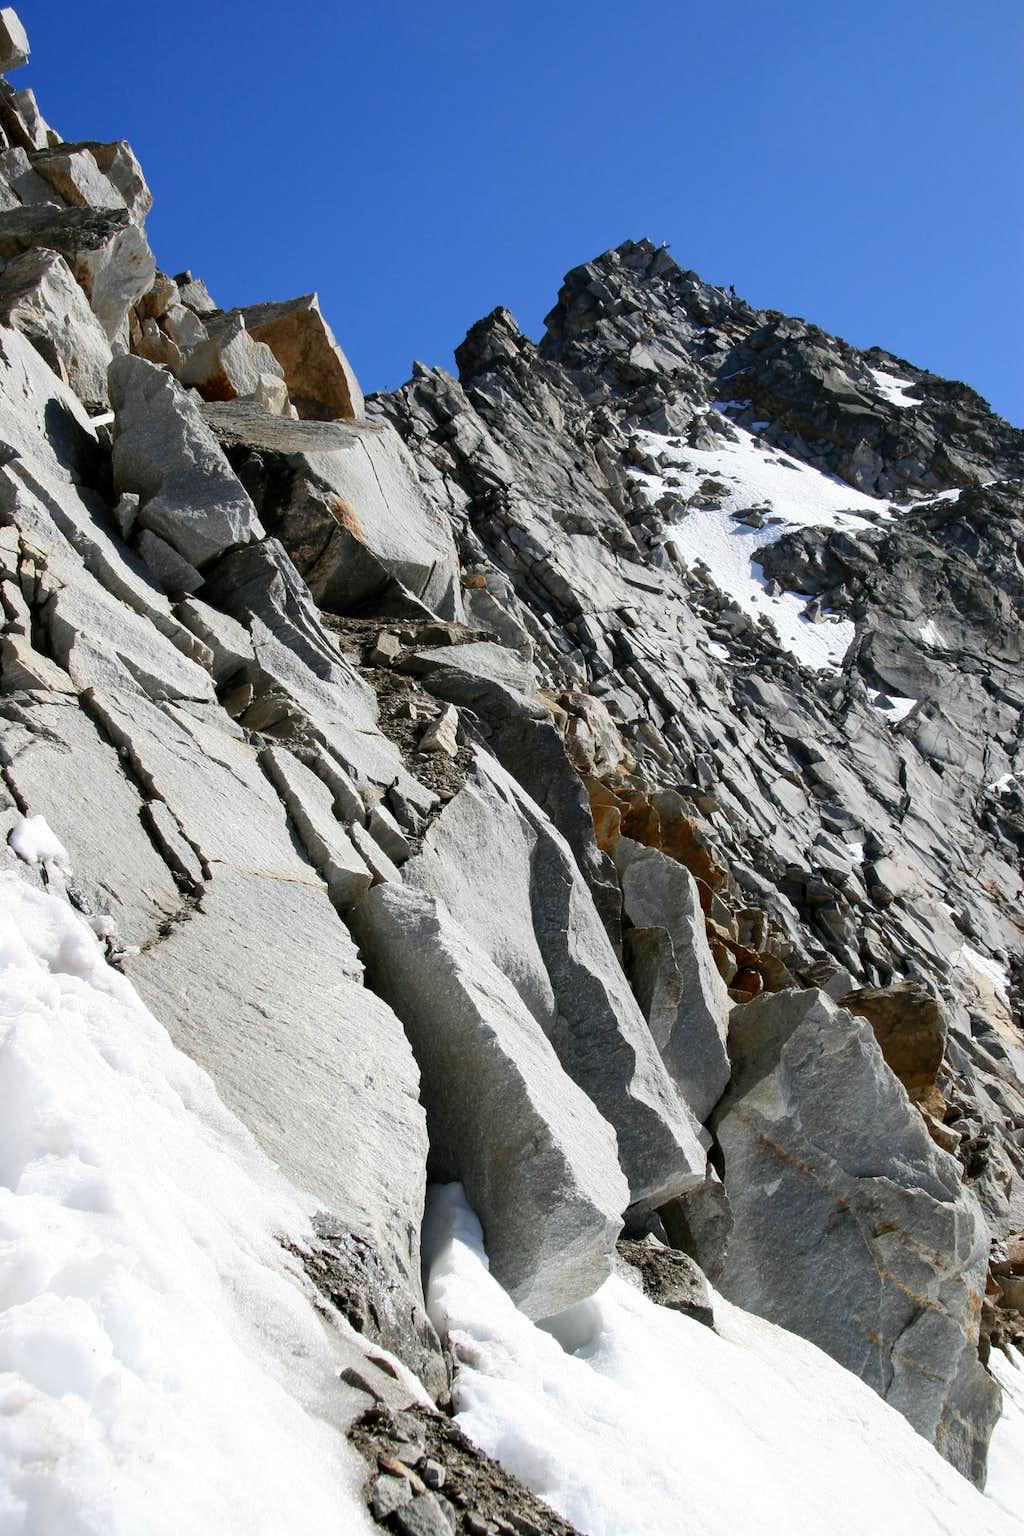 Detmolder ridge